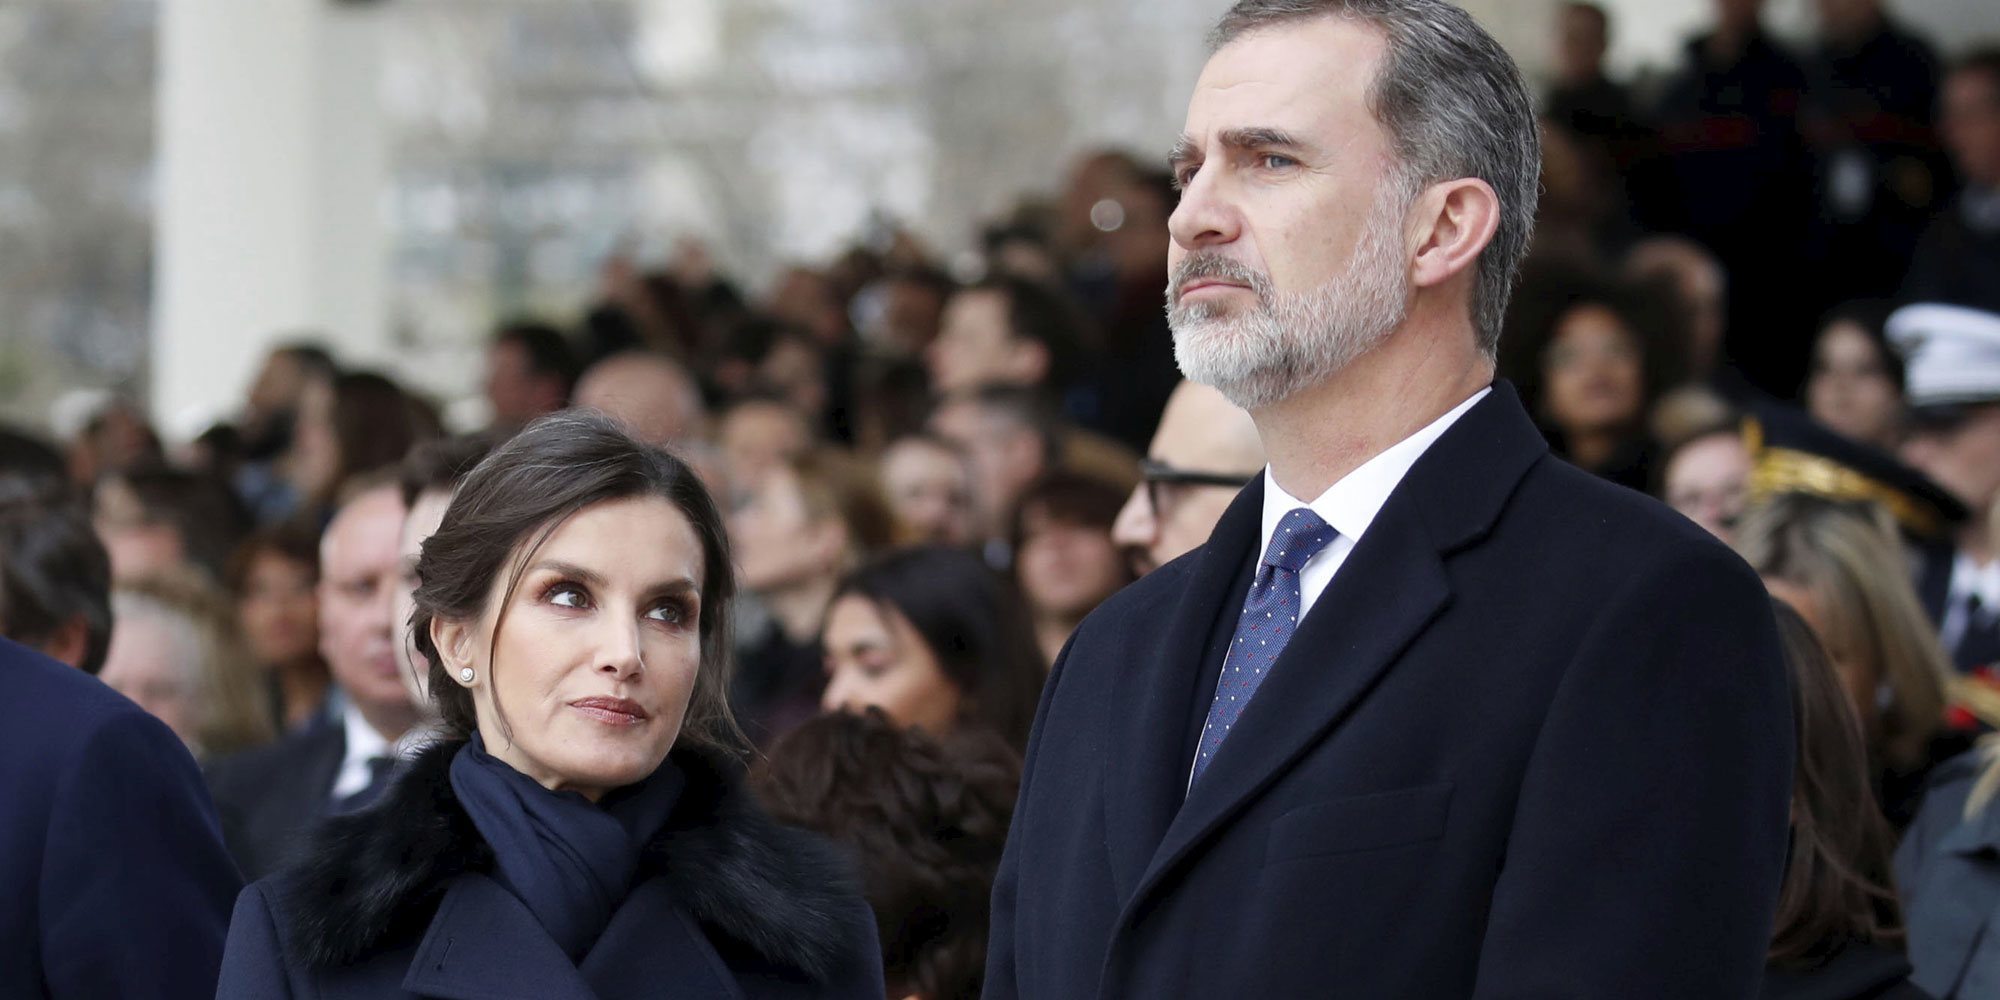 La labor de los Reyes Felipe y Letizia frente al coronavirus les aleja de otras Familias Reales